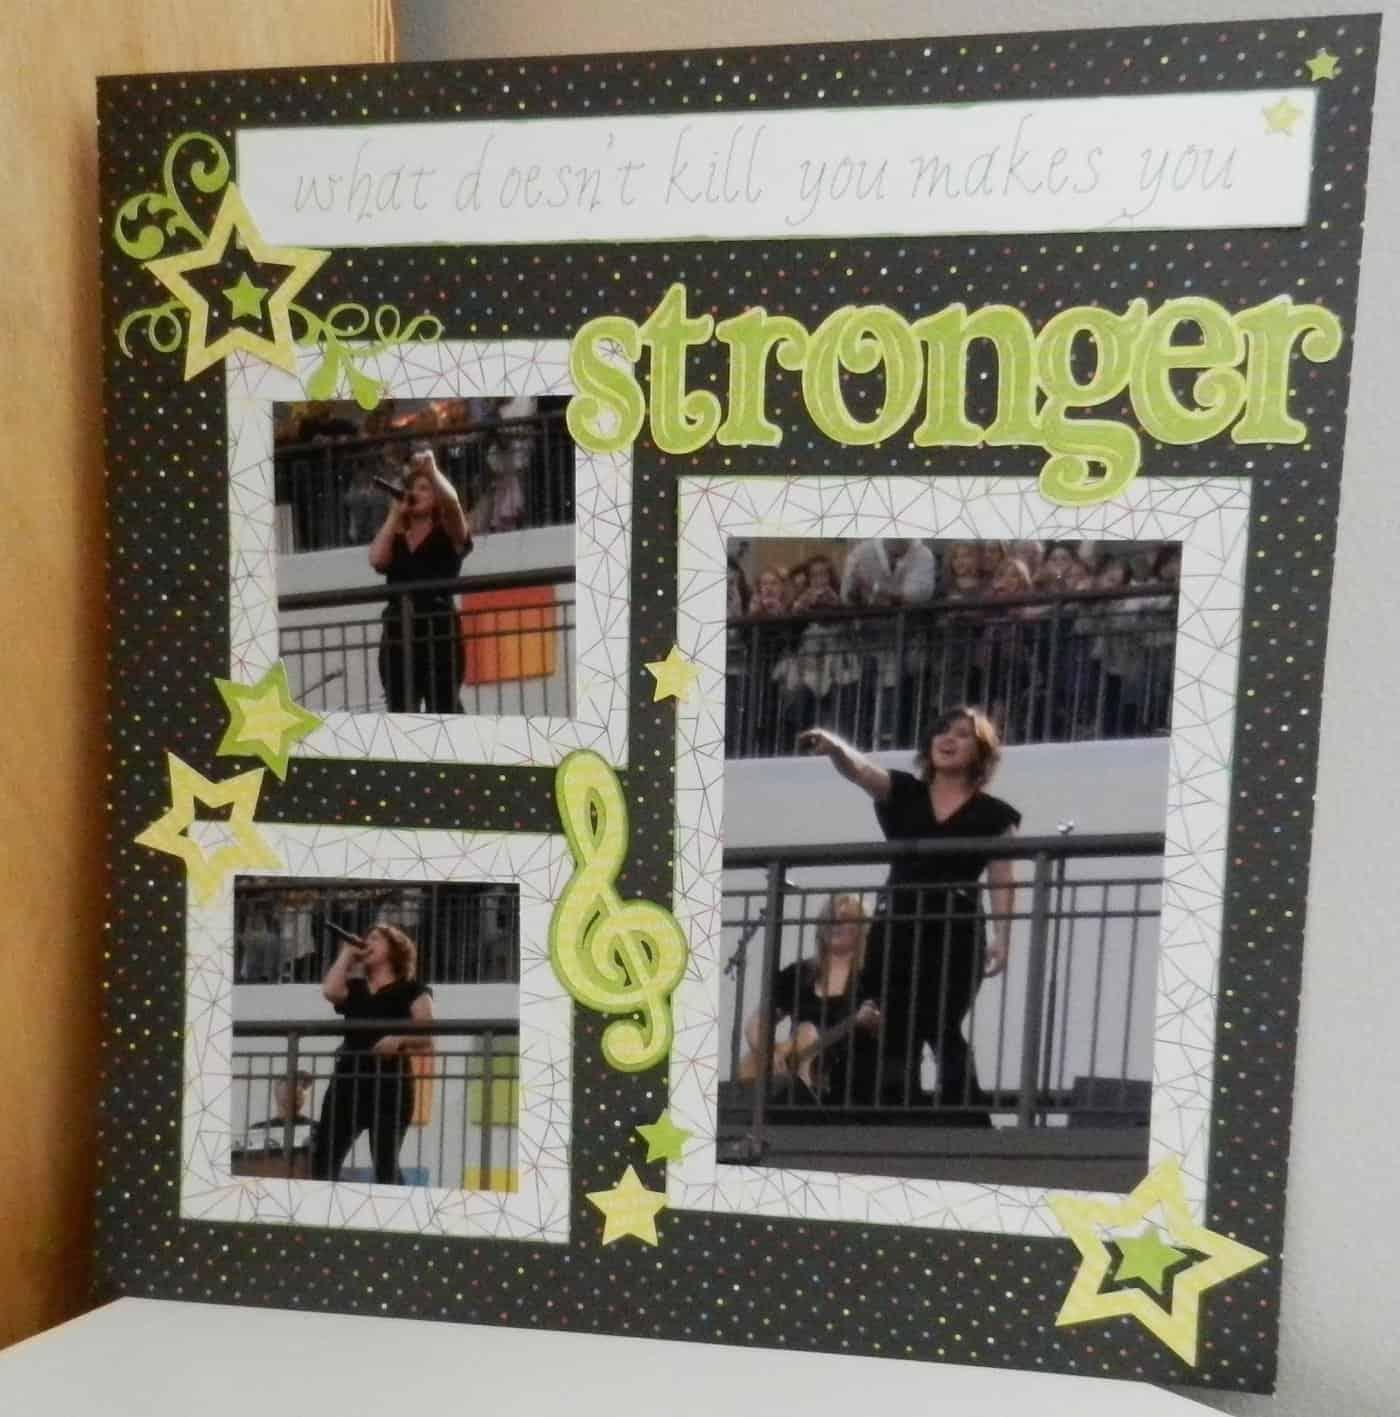 Kelly Clarkson concert scrapbook